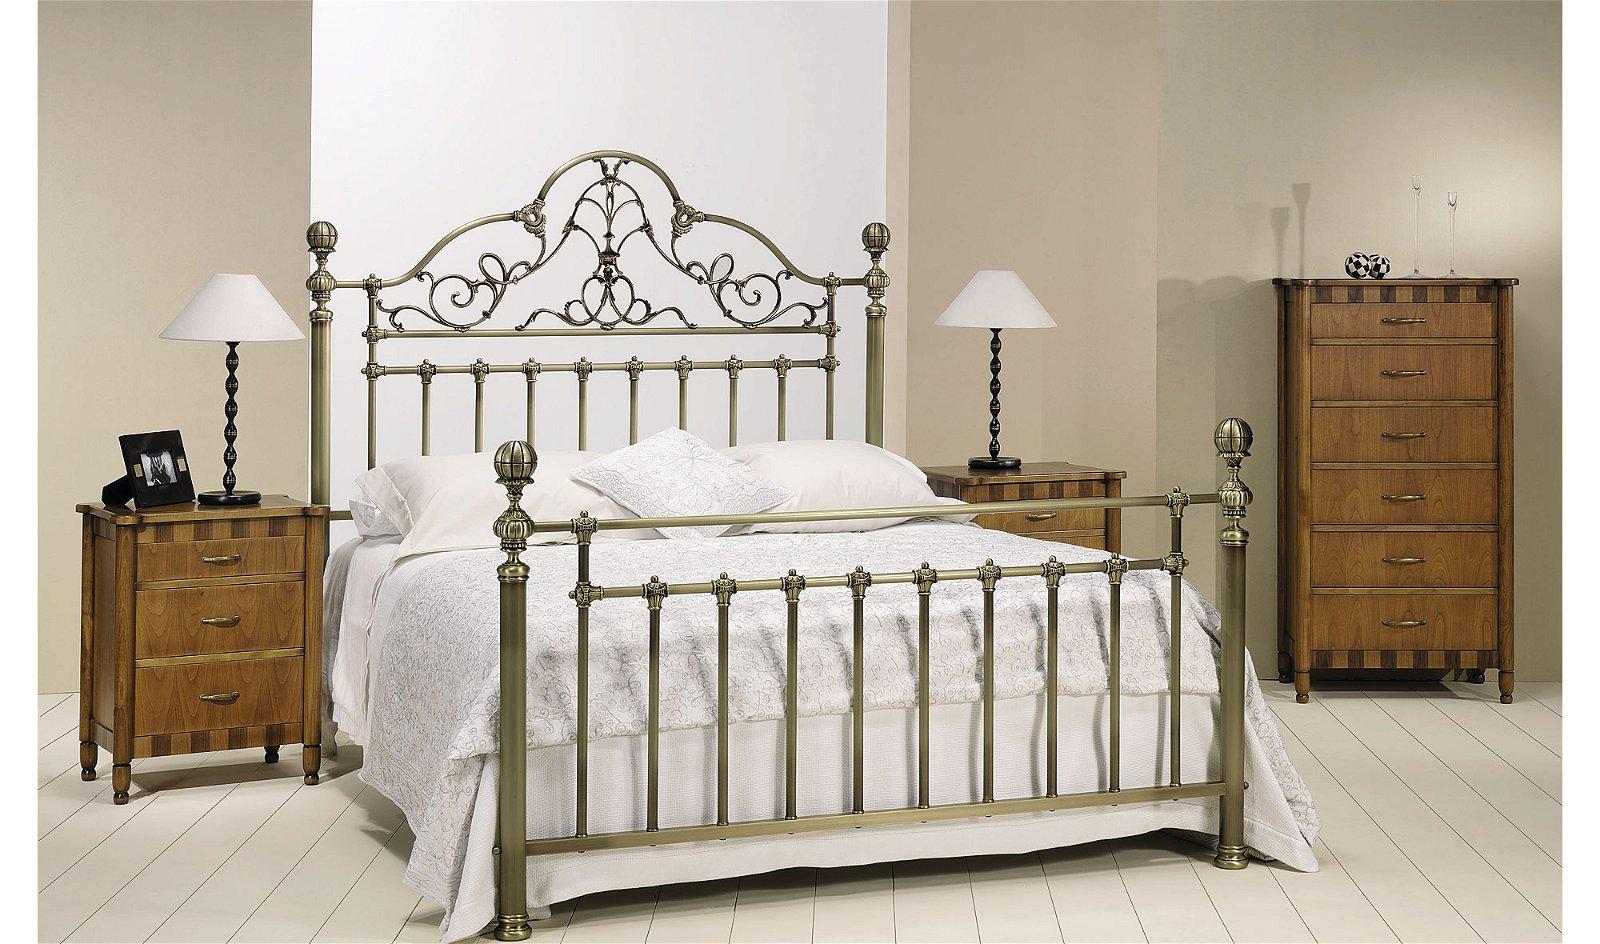 Dormitorio forja Cristina